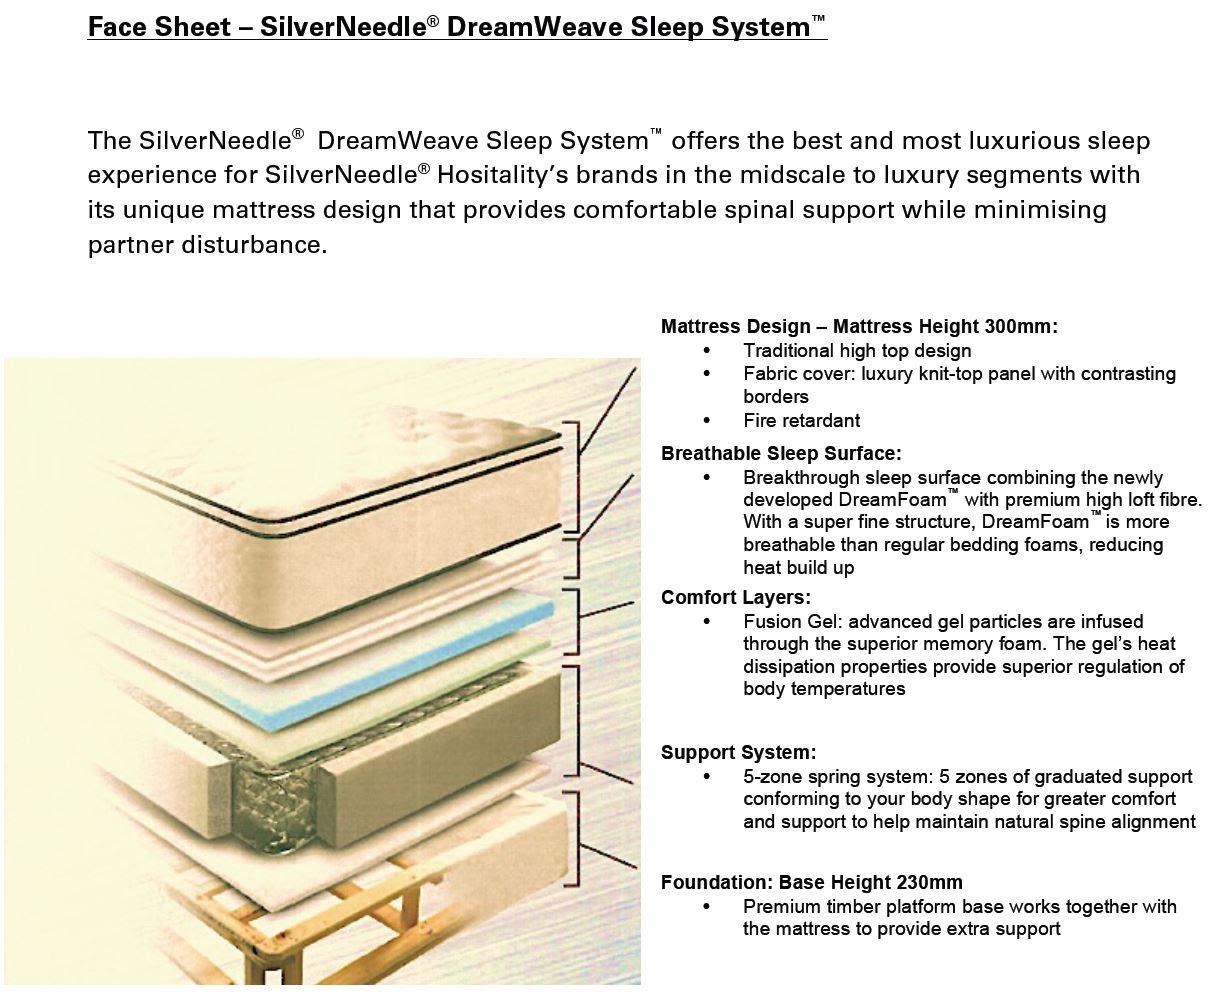 SilverNeedle DreamWeave Sleep System